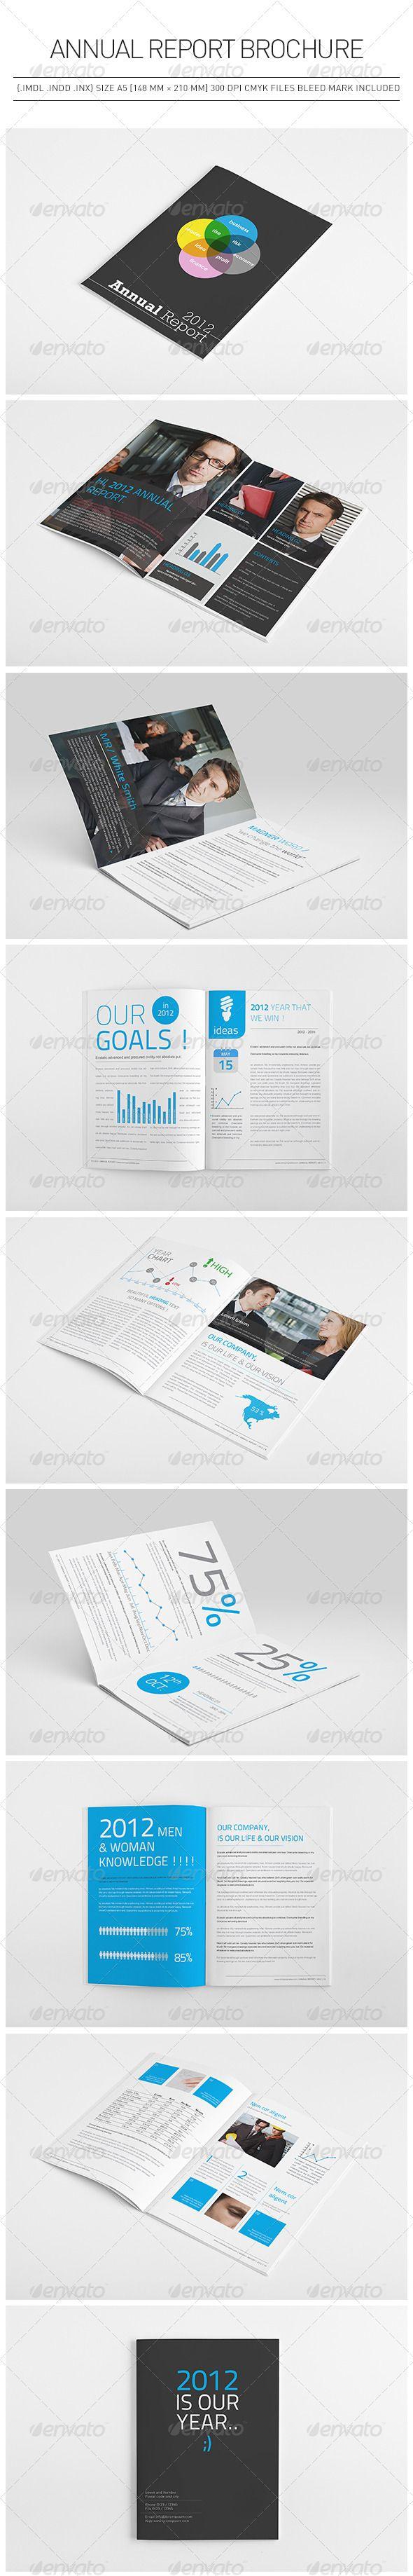 69 besten Corporate Reports Bilder auf Pinterest | Audi